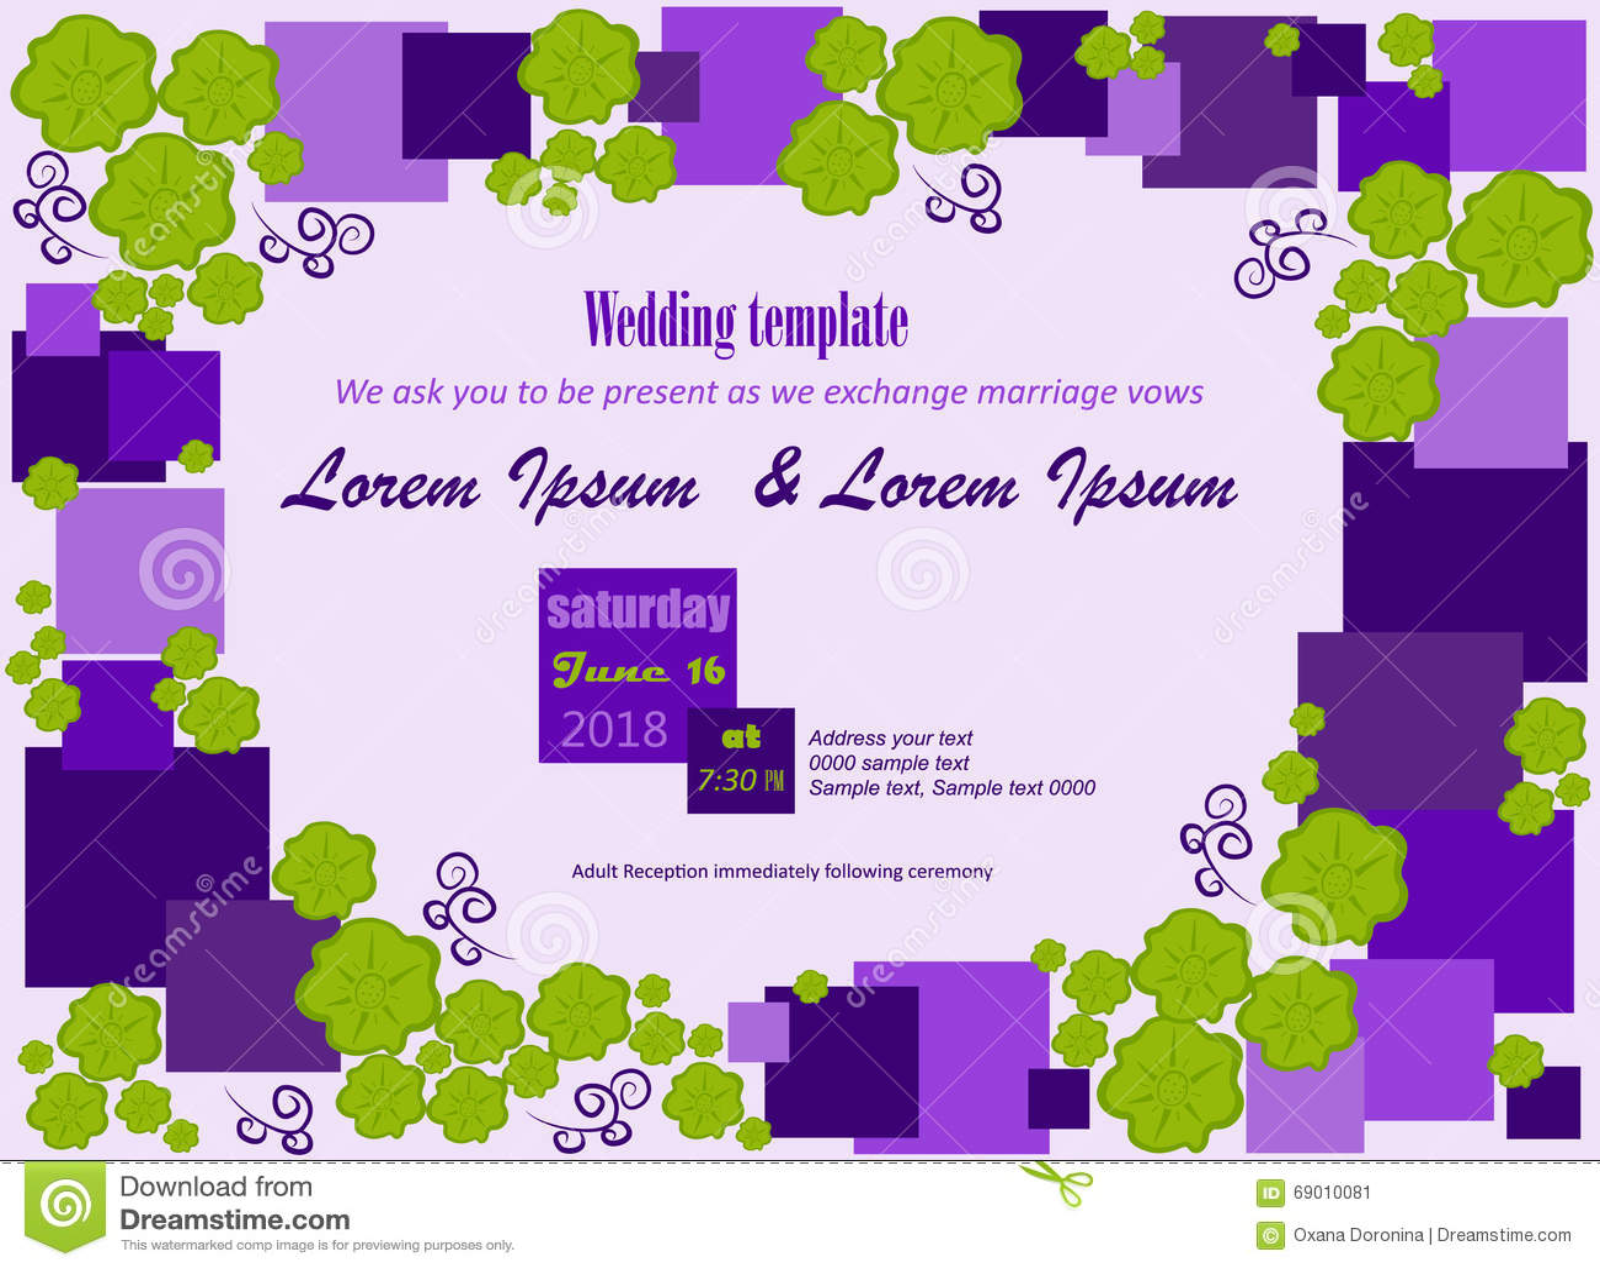 Wedding Invitation Squares Flowers Stock Vector - Illustration of ...